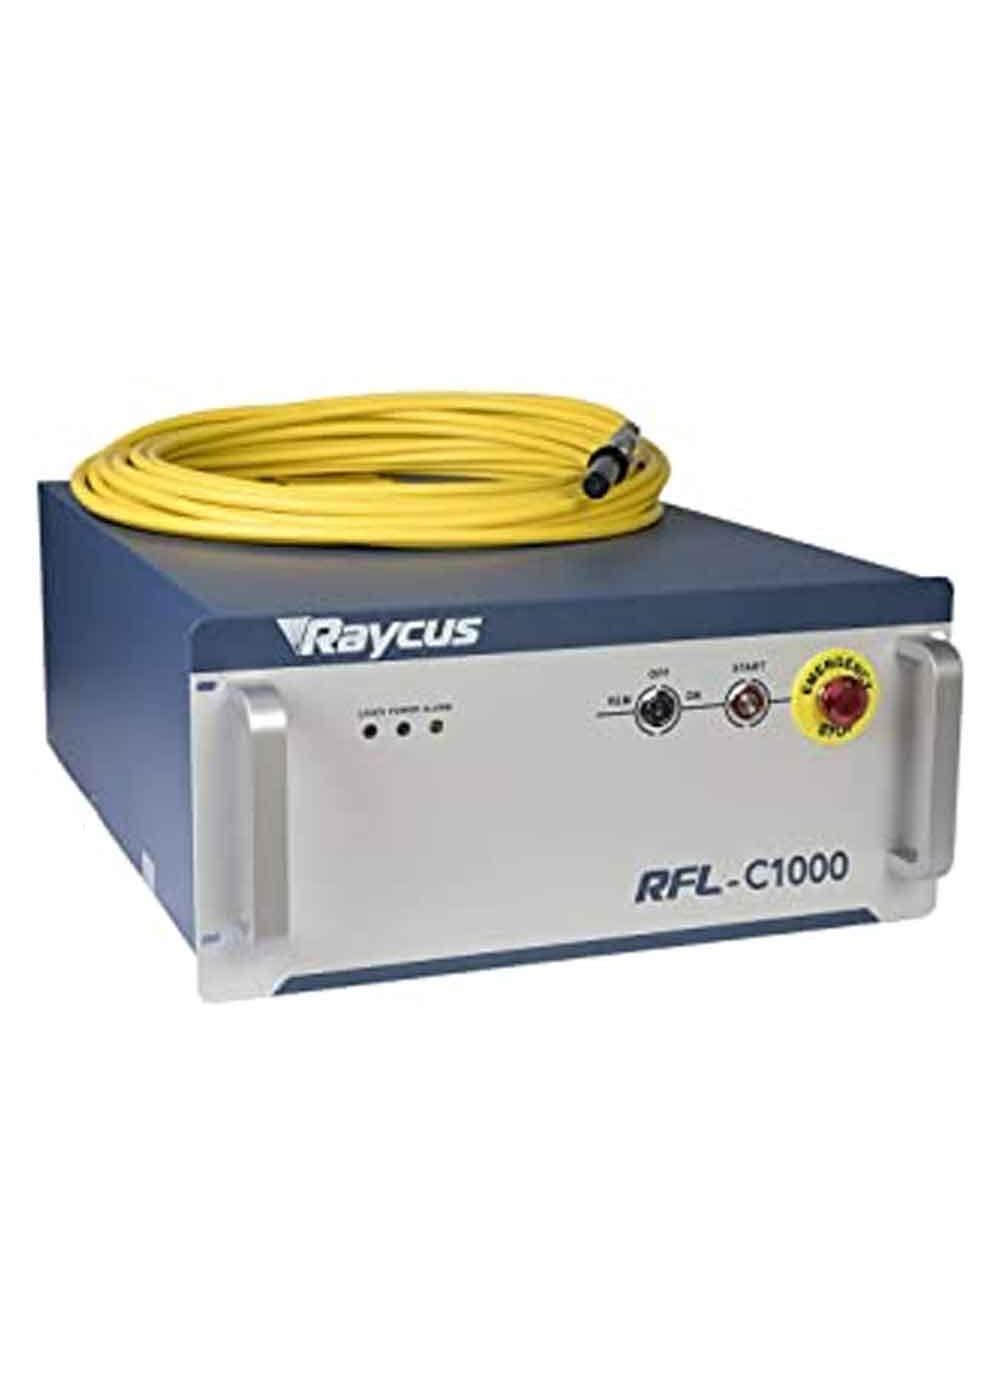 RAYCUS FİBER LAZER RFL-C1000